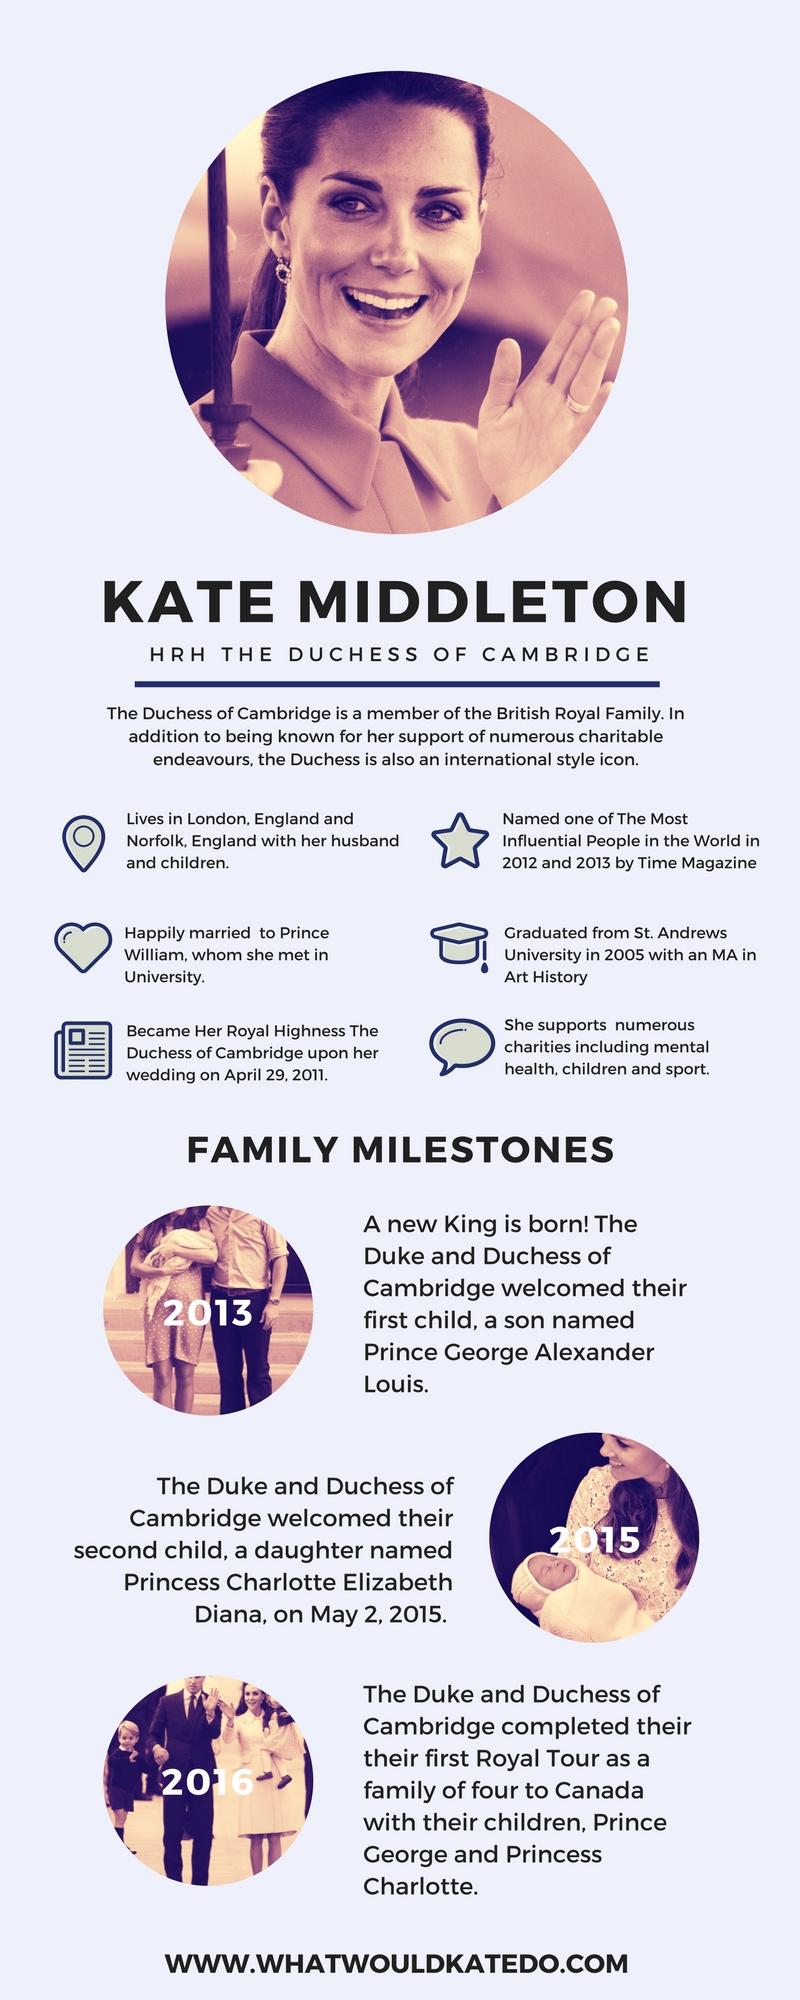 kate-middleton-infographic